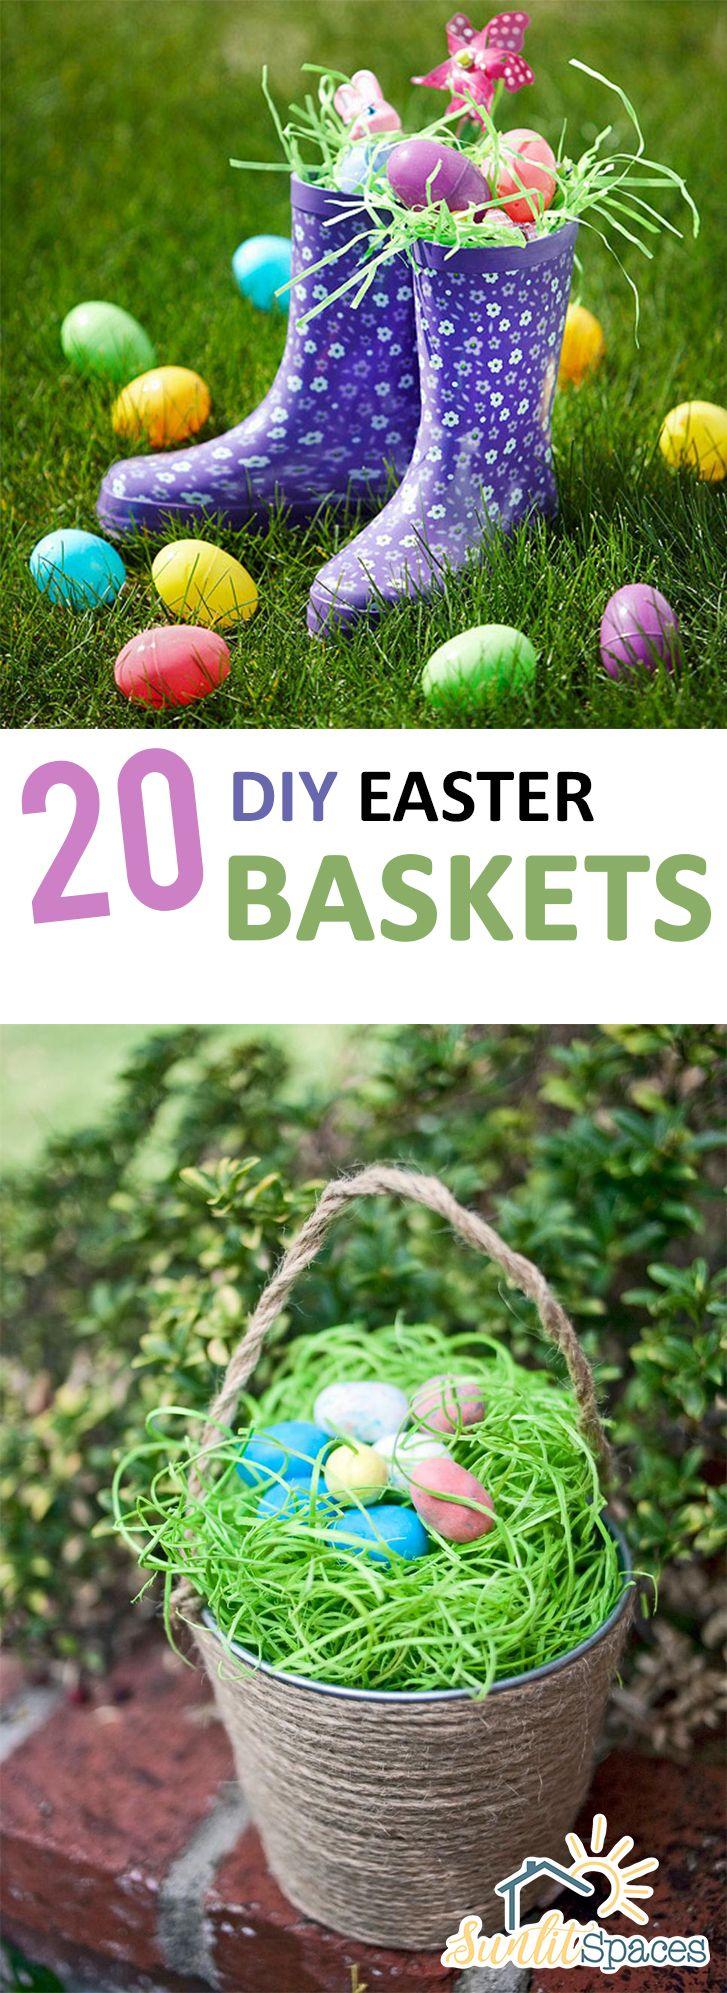 Handmade Easter Baskets Ideas : Best ideas about homemade easter baskets on